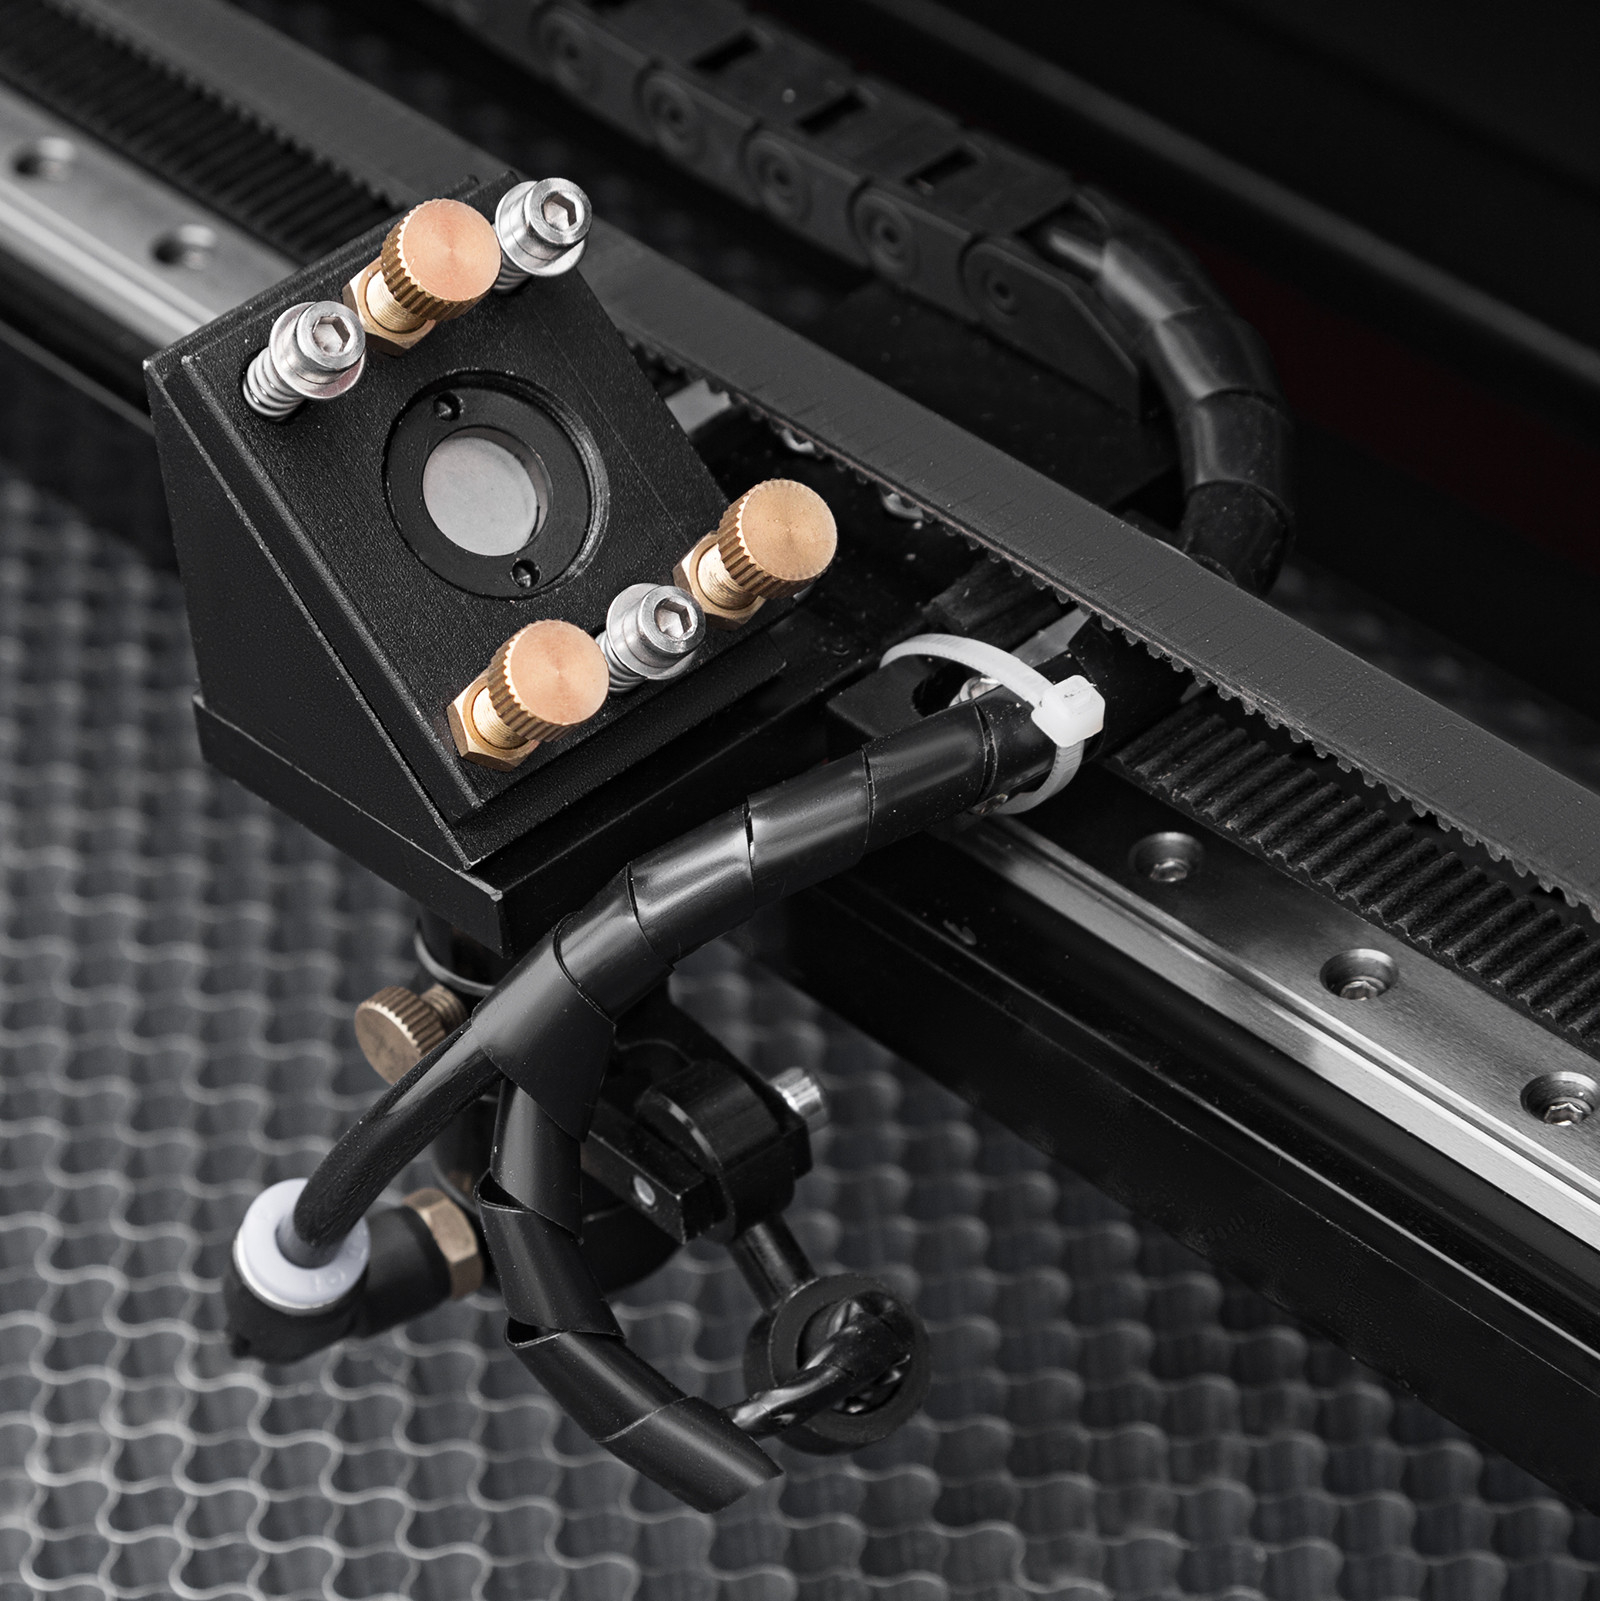 Macchina-per-Incisione-Laser-CO2-40-130W-Asse-Rotante-Tagliatrice-Incisore miniatura 45